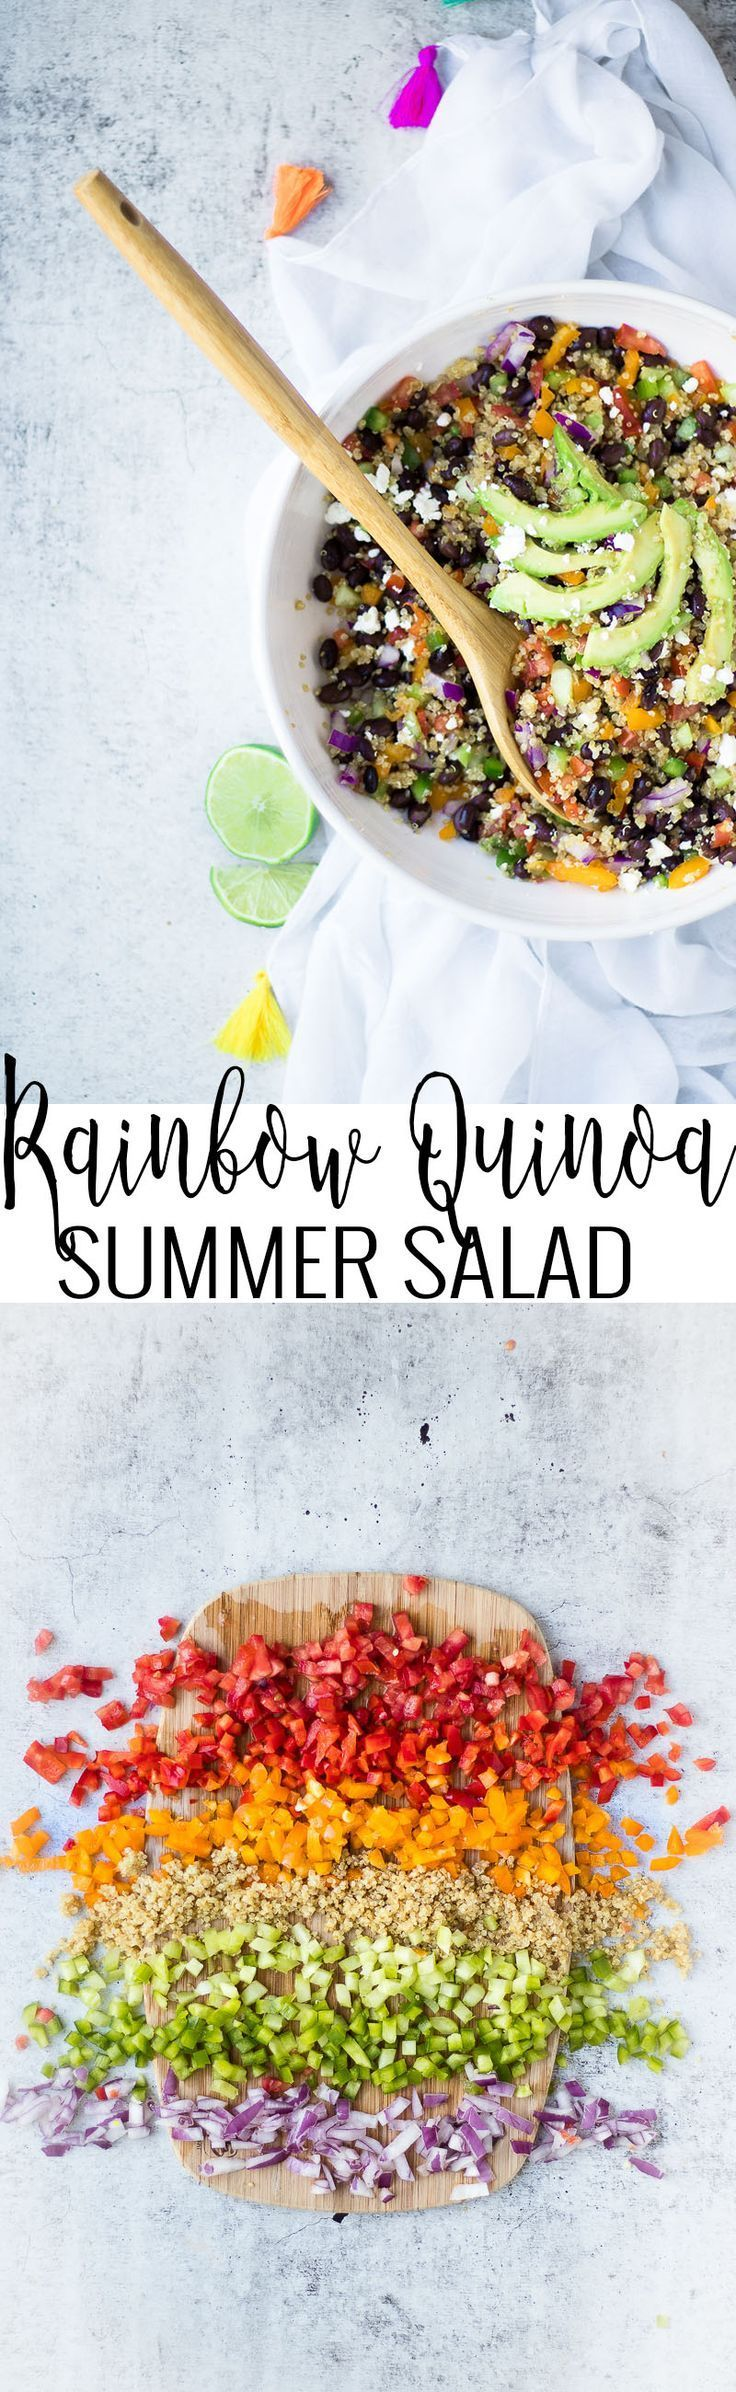 Rainbow Quinoa Salad | healthy dinner recipes | healthy salad recipes | salad recipe ideas | recipes using quinoa | how to cook quinoa | quinoa salad recipes | healthy lunch recipes | recipes using fresh vegetables | healthy summer salad | summer recipe i